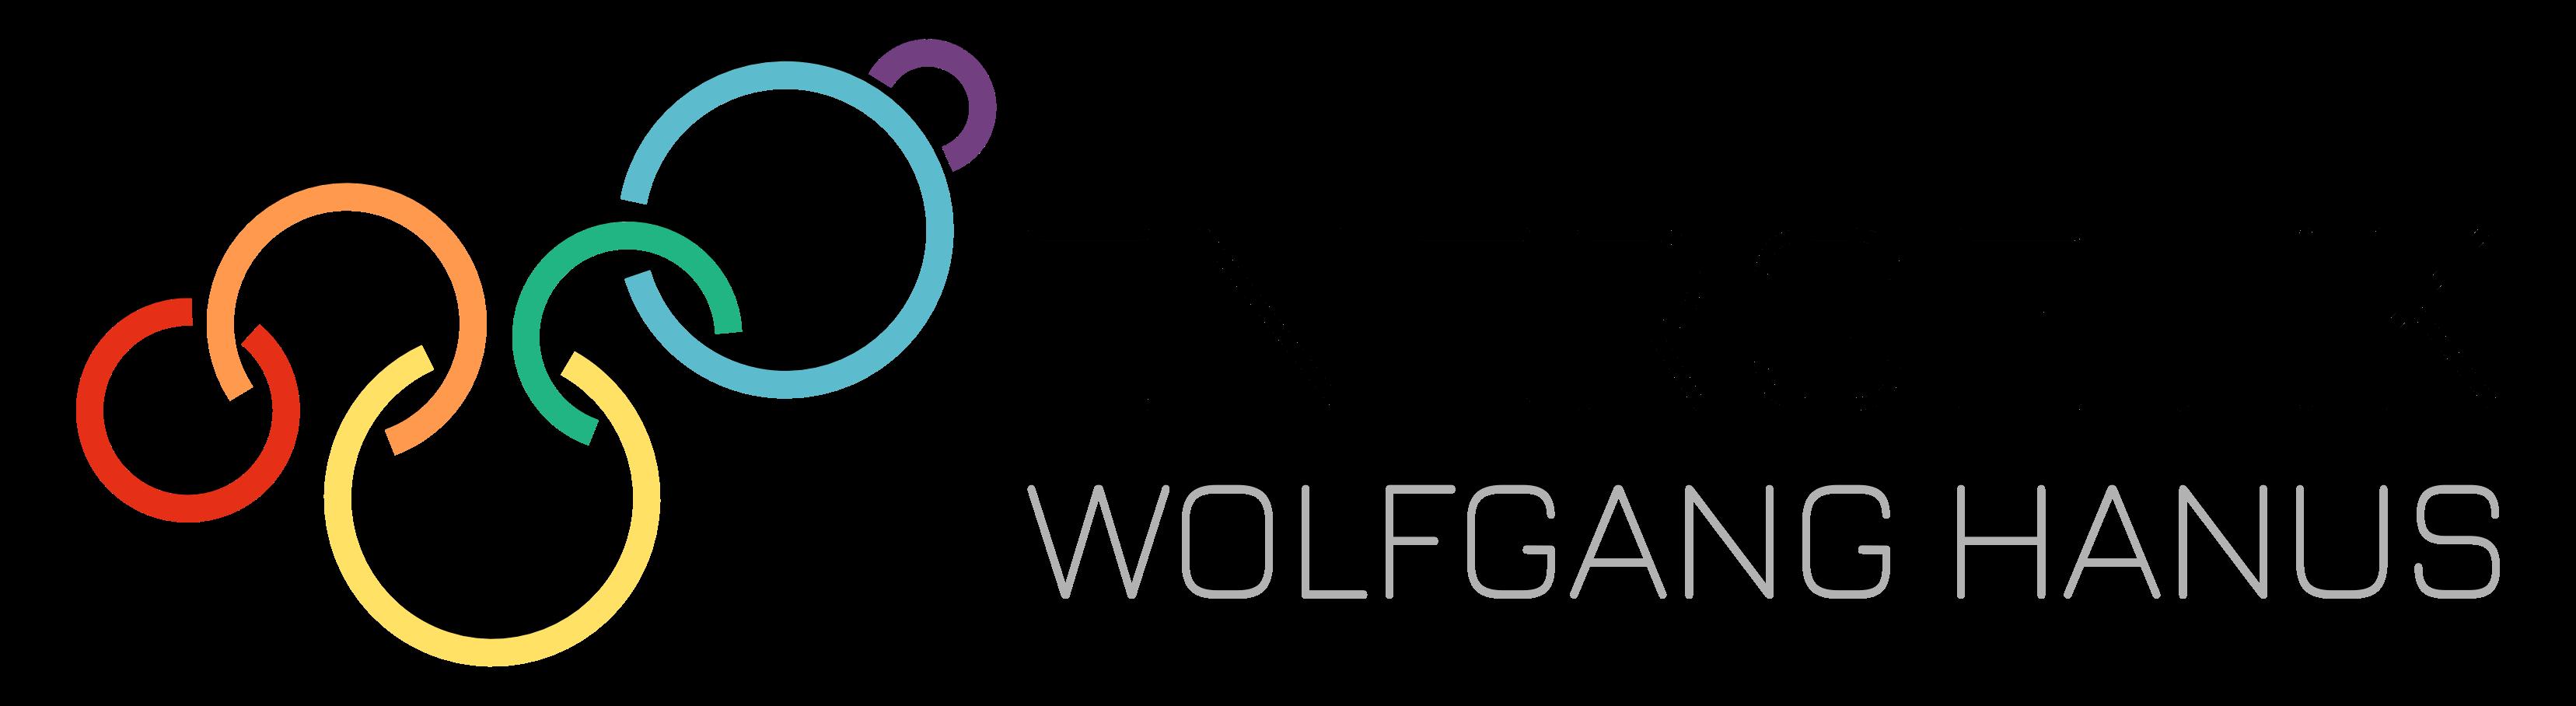 Energetik Wolfgang Hanus